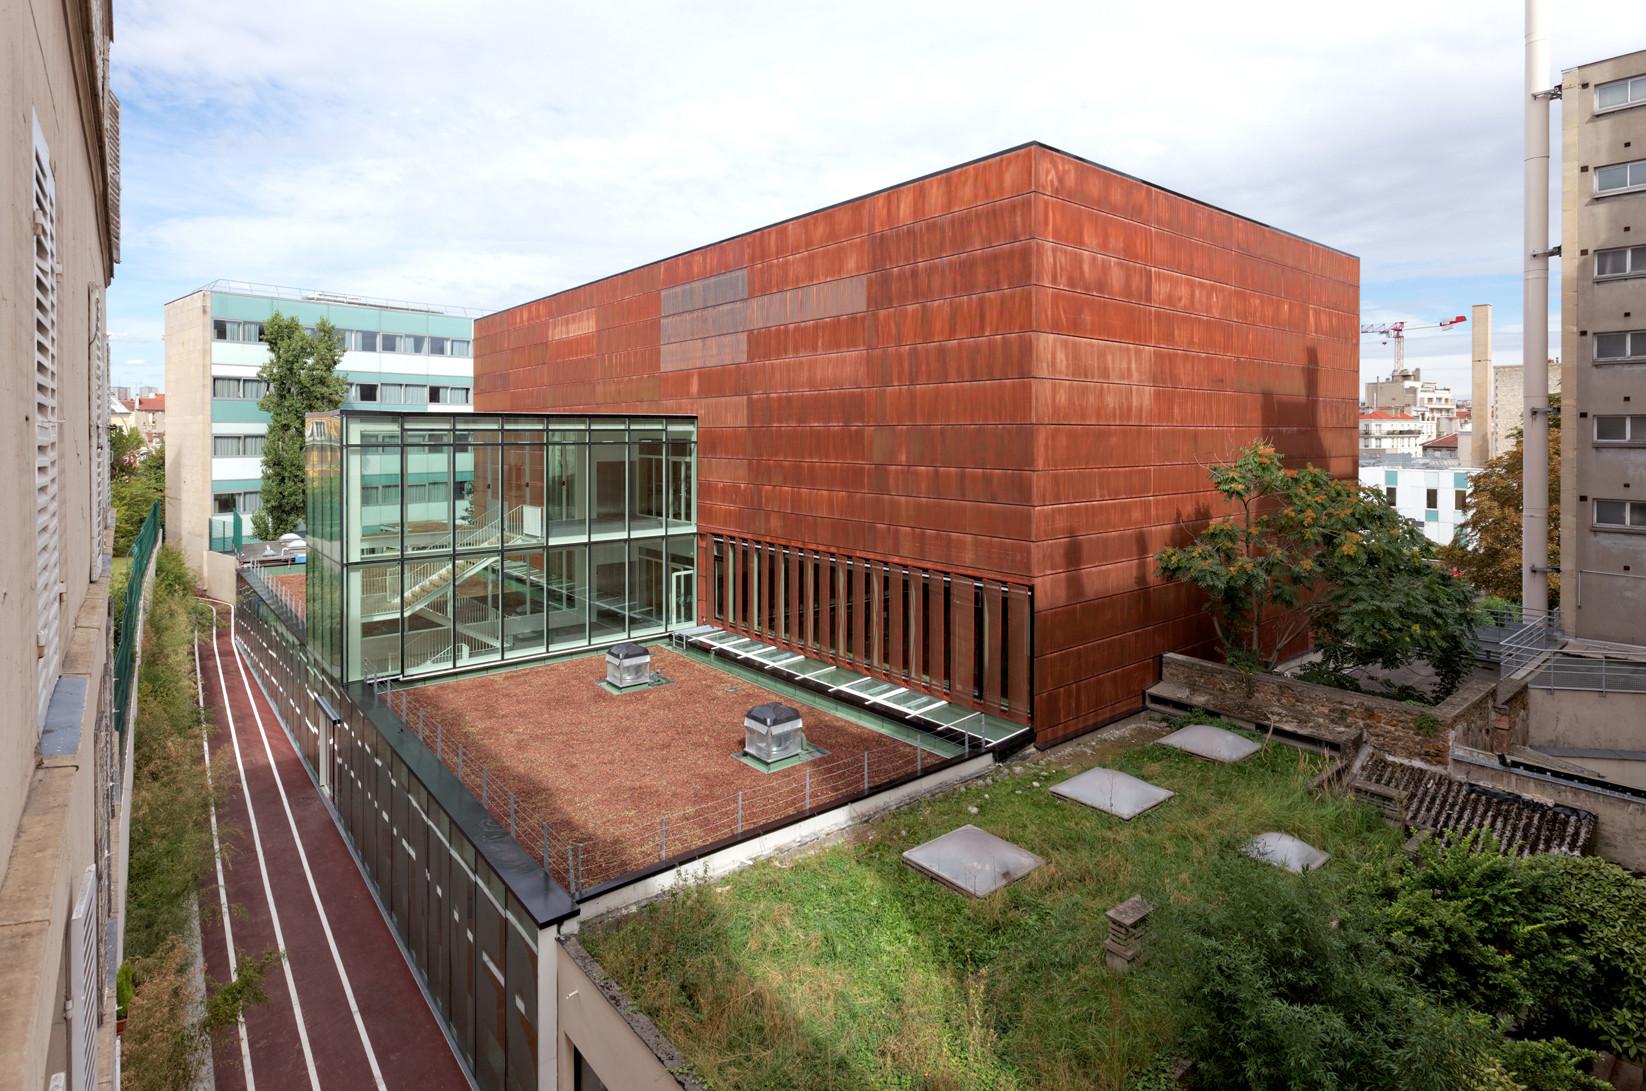 241 sports center hector berlioz dietmar feichtinger for Architectes de france